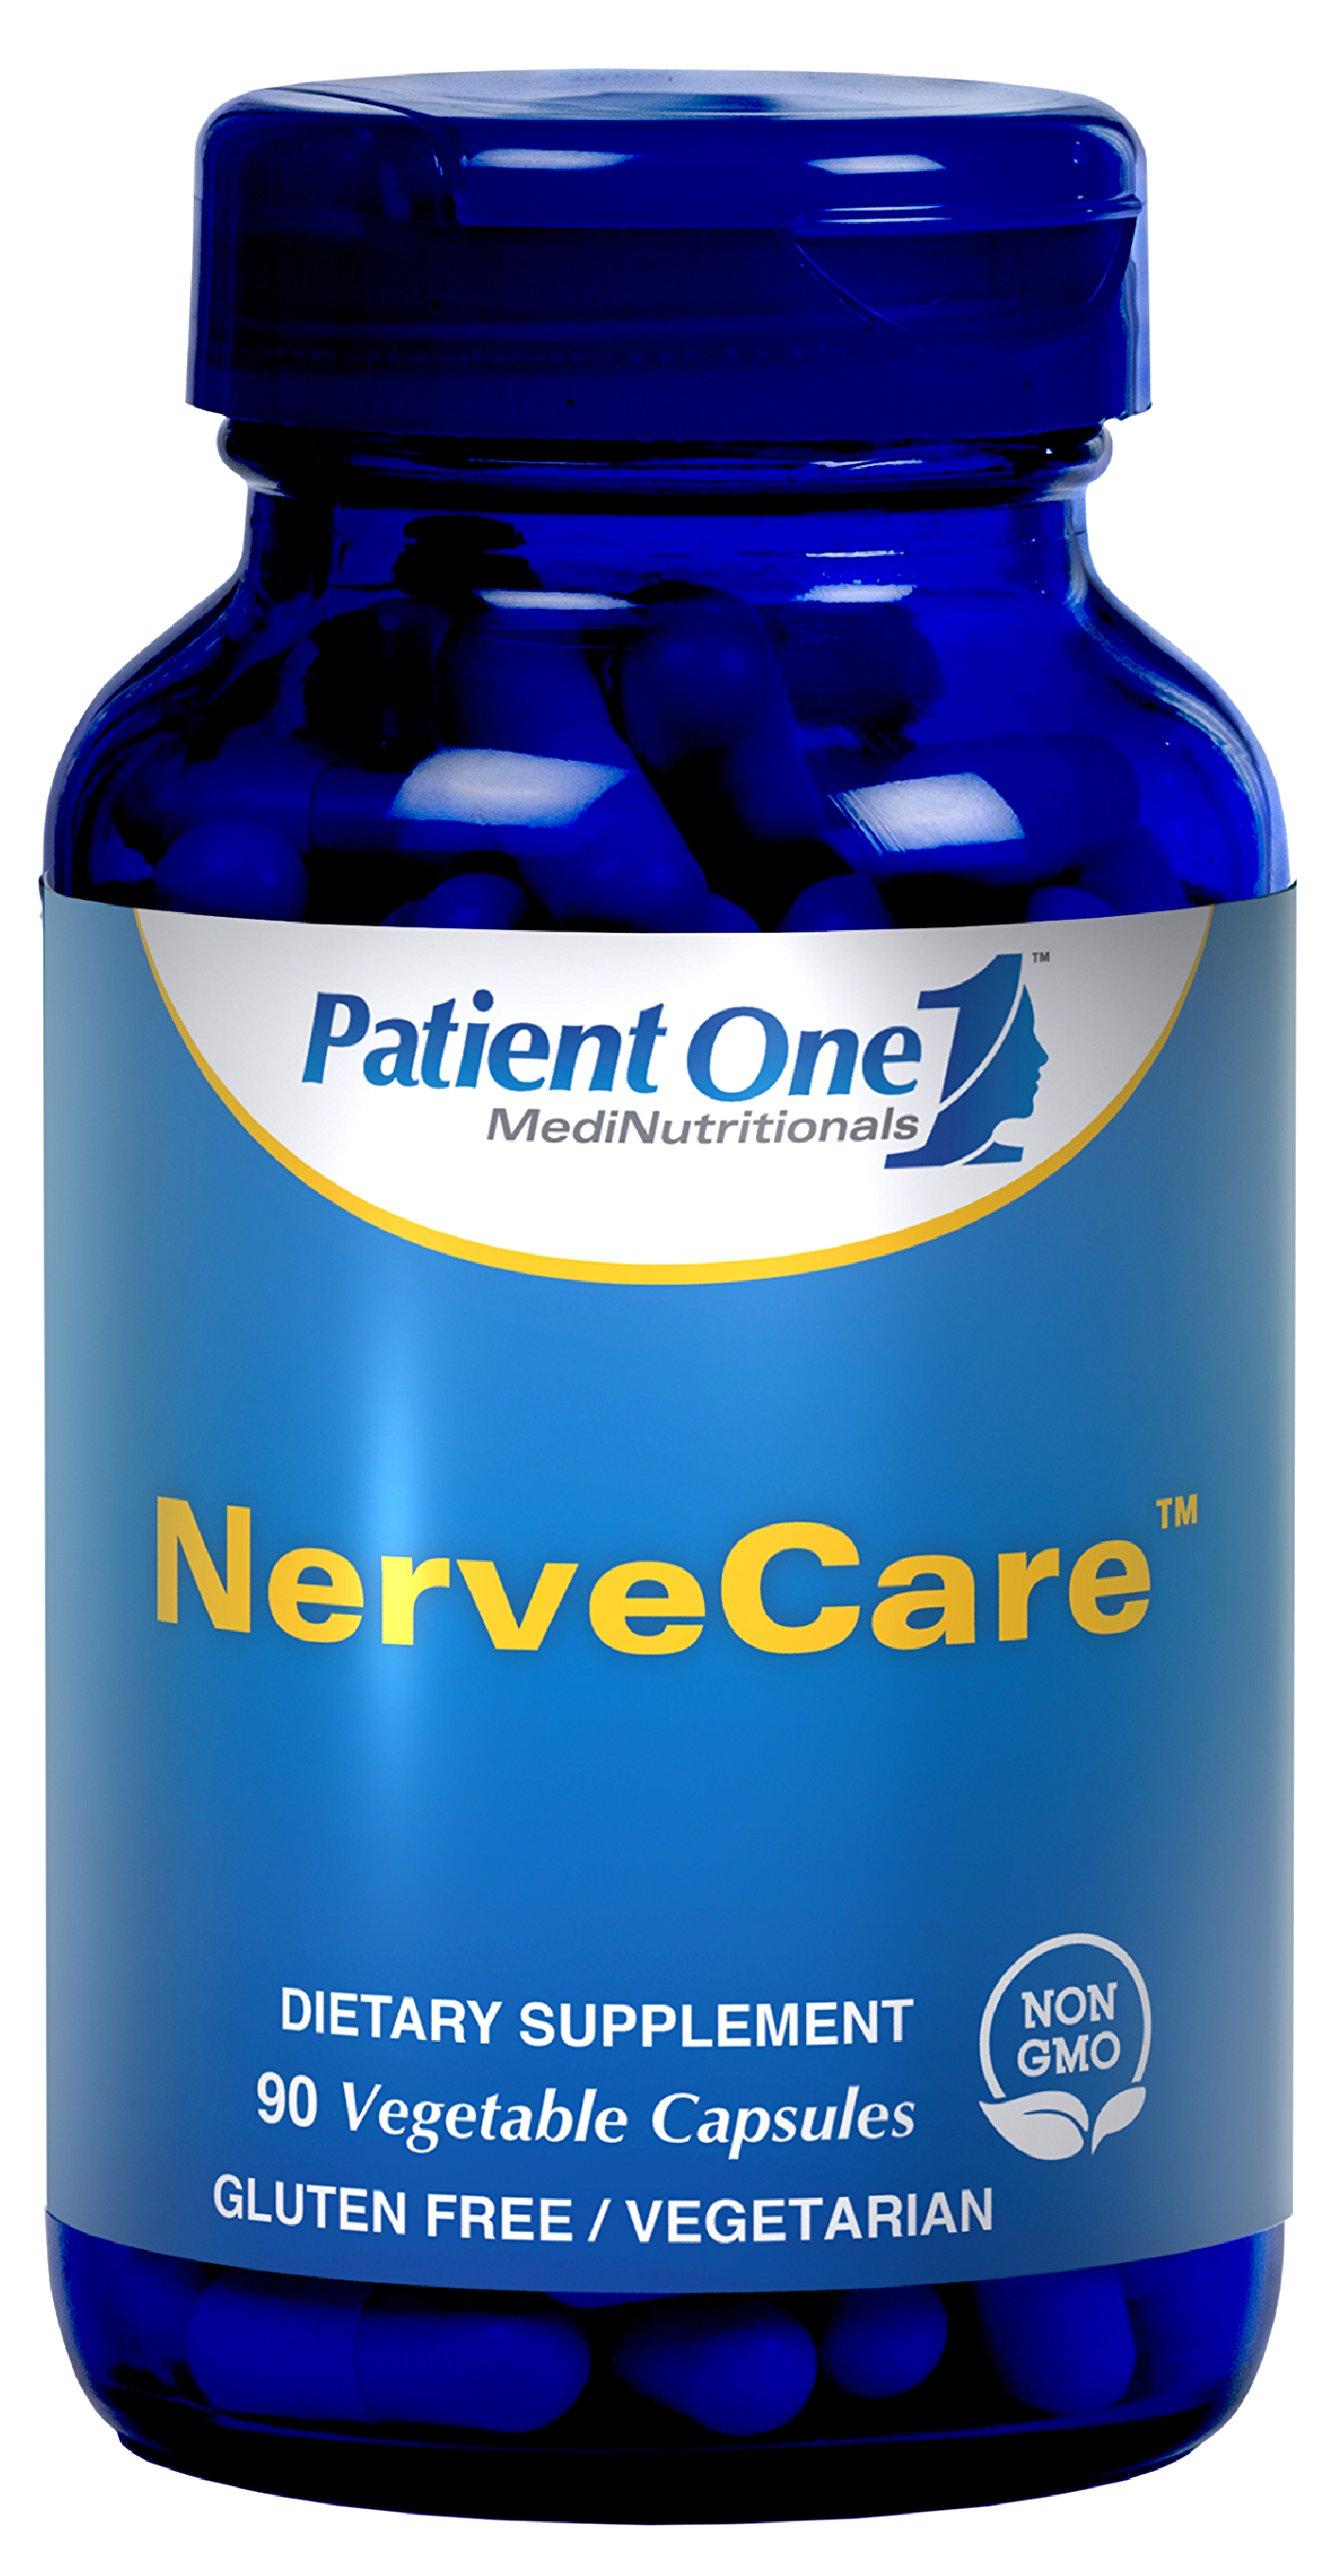 Patient One NerveCare™ - 90 Vegetable Capsules